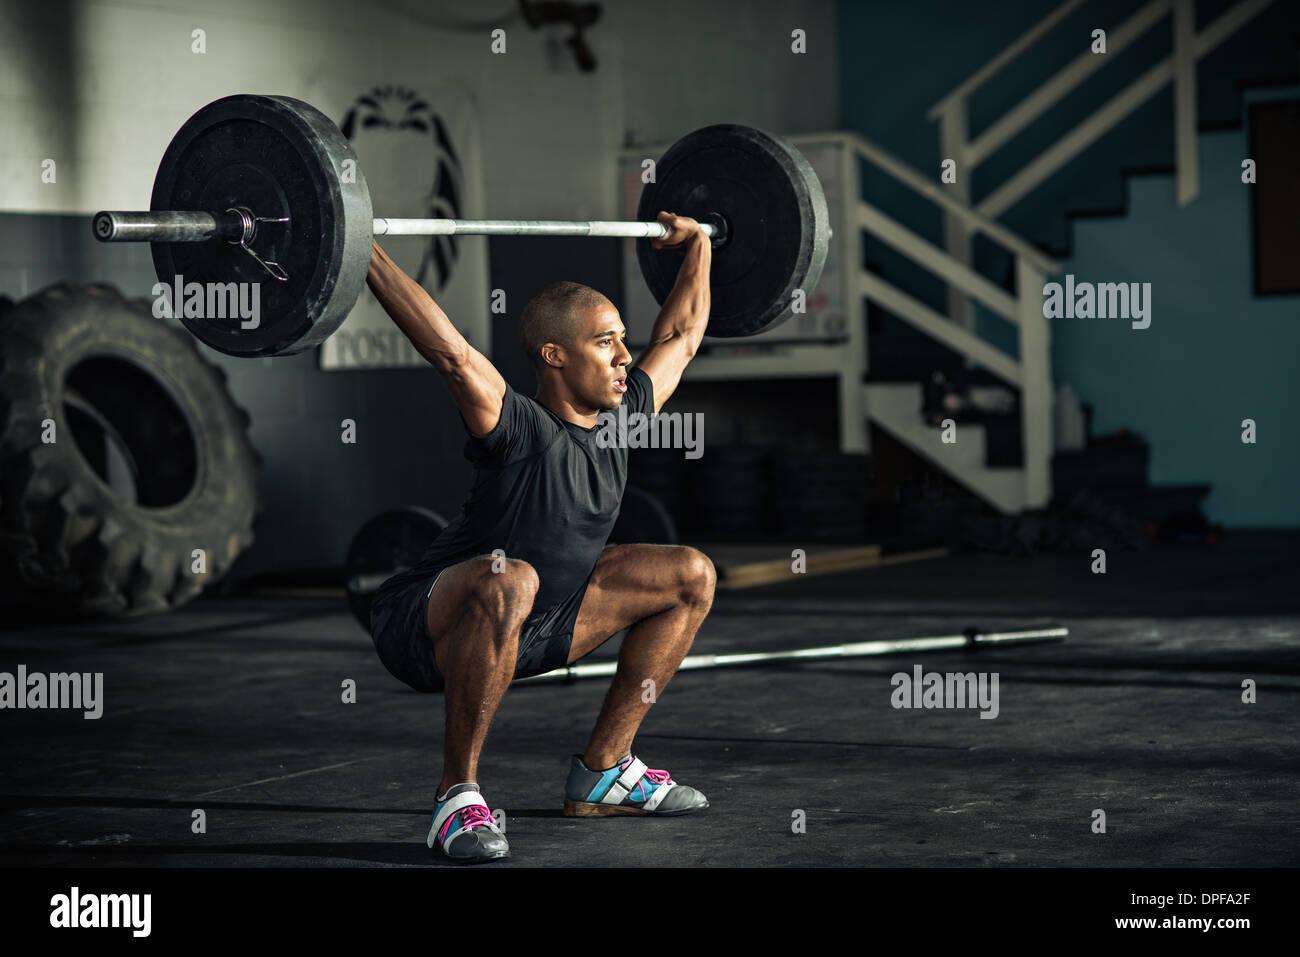 Joven barras pesas en el gimnasio Imagen De Stock